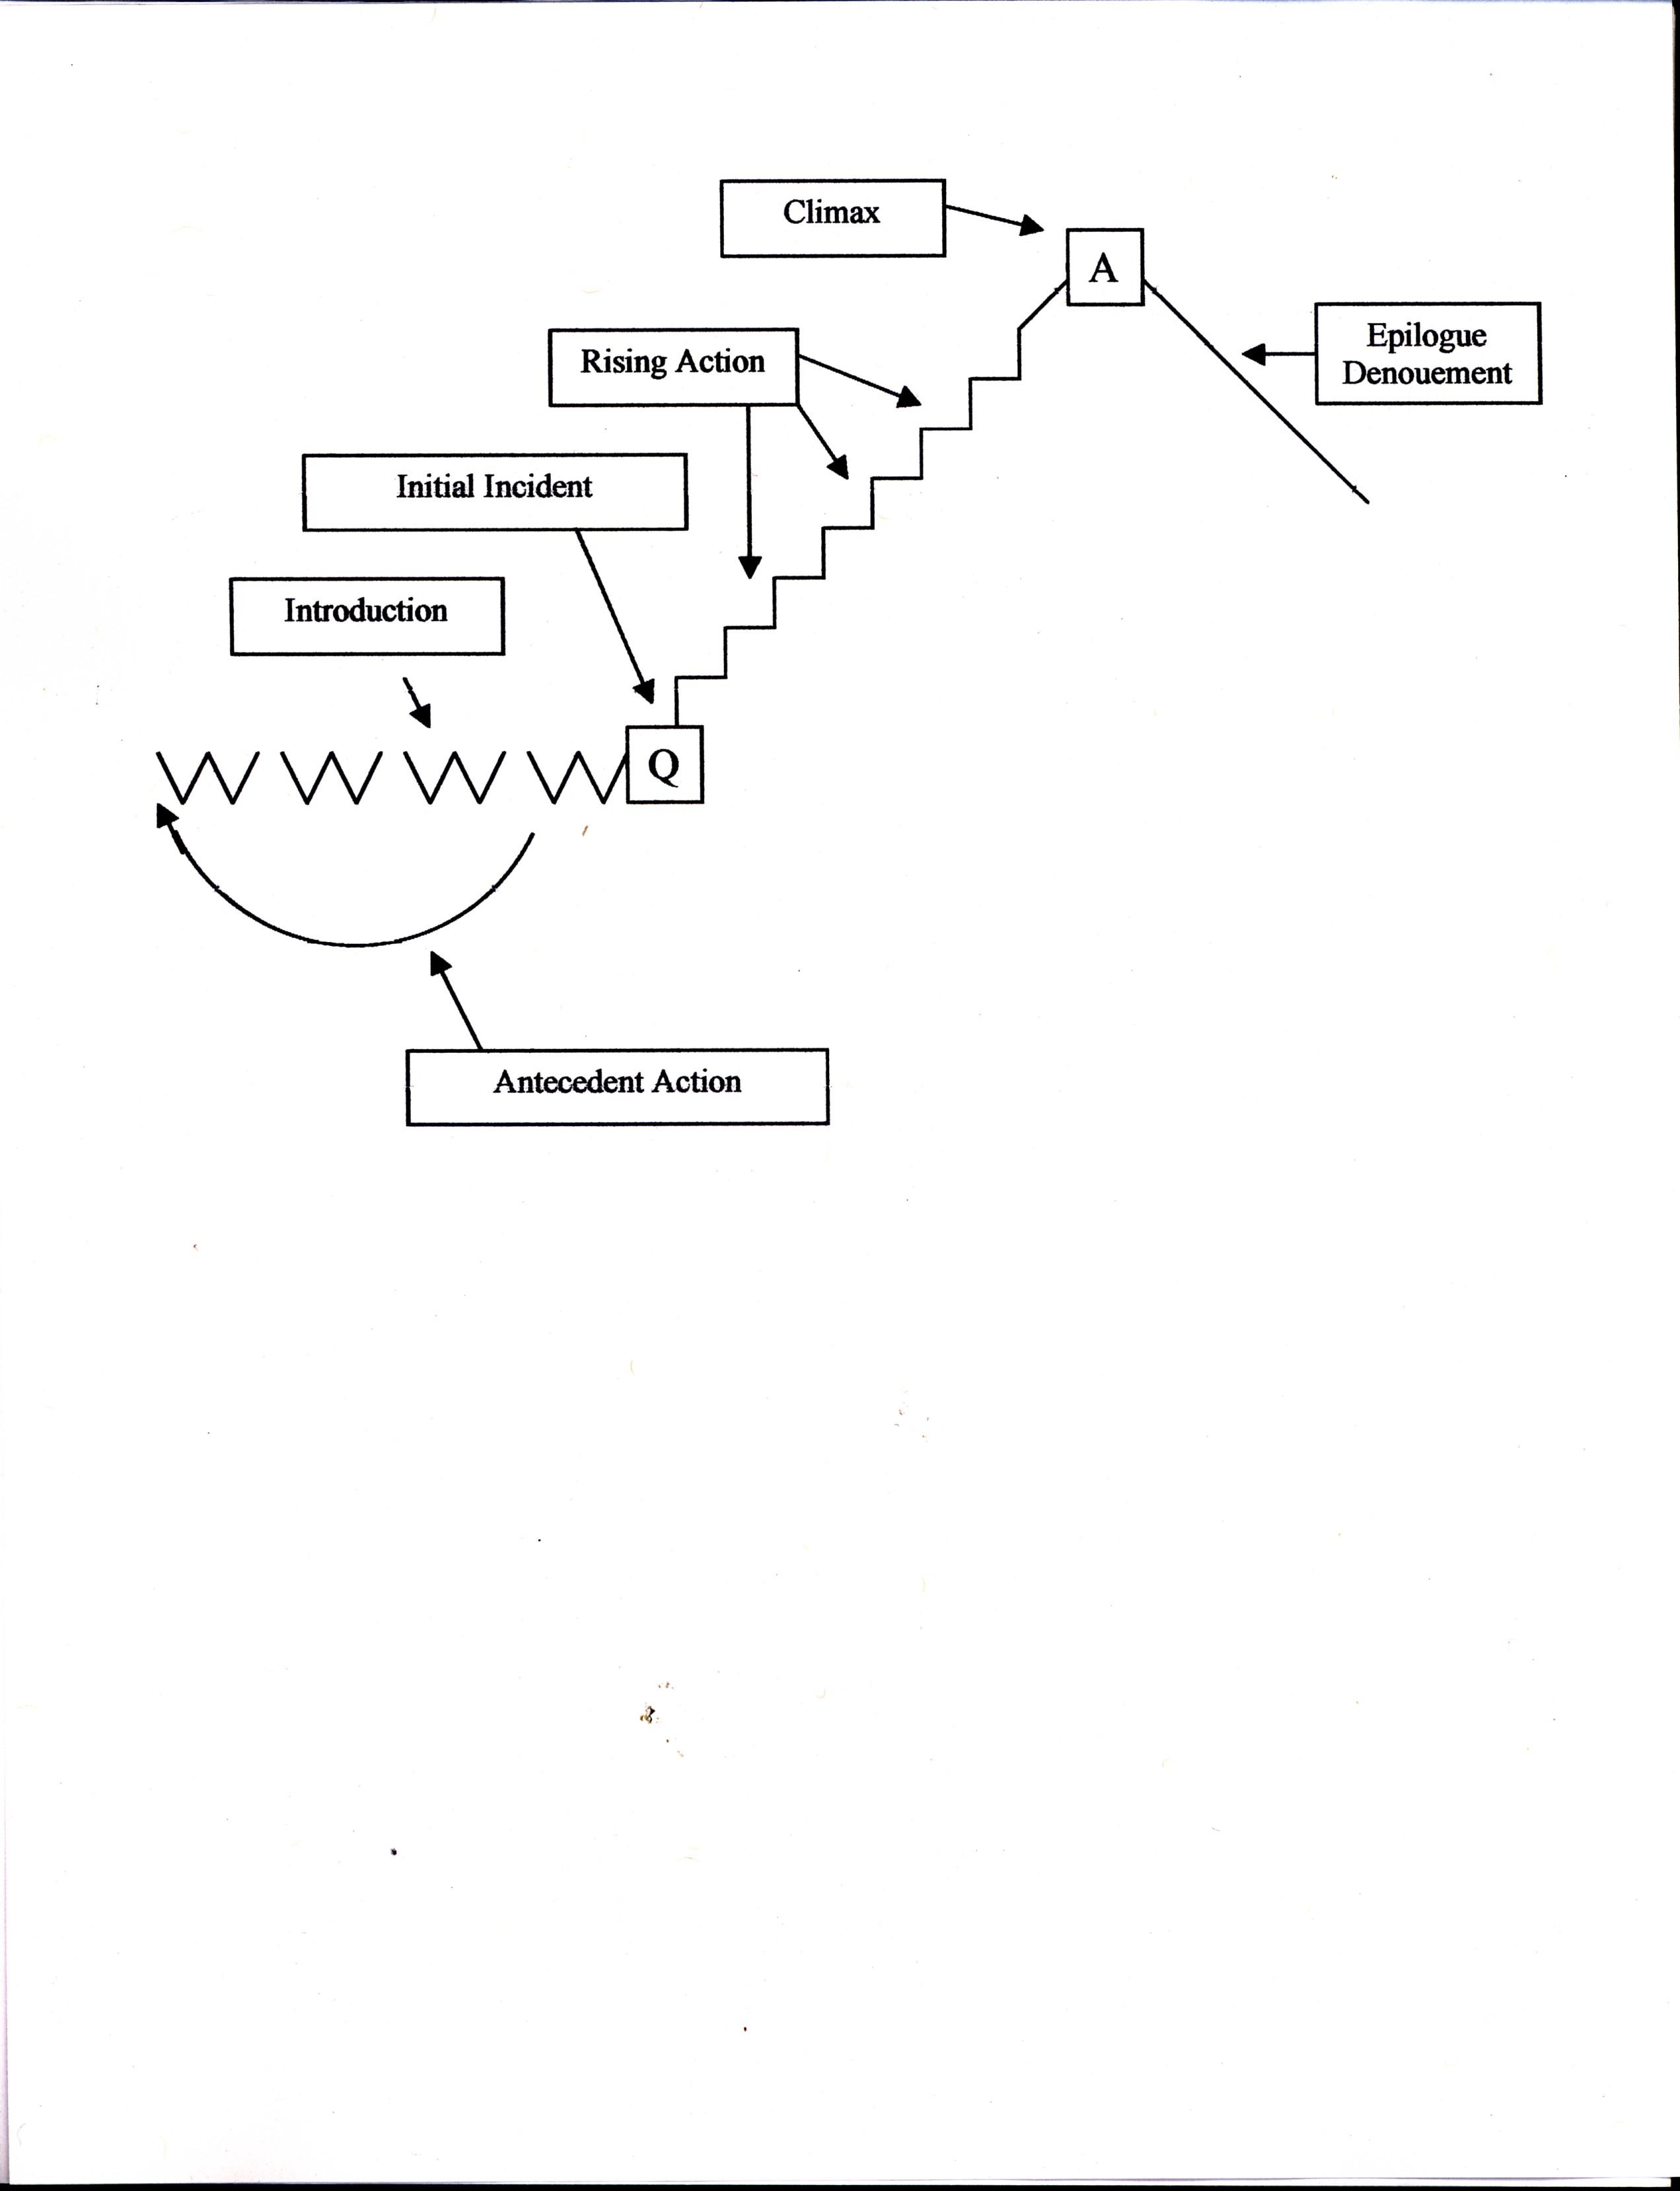 Book report plot diagram welcomedpigs book report plot diagram ccuart Gallery